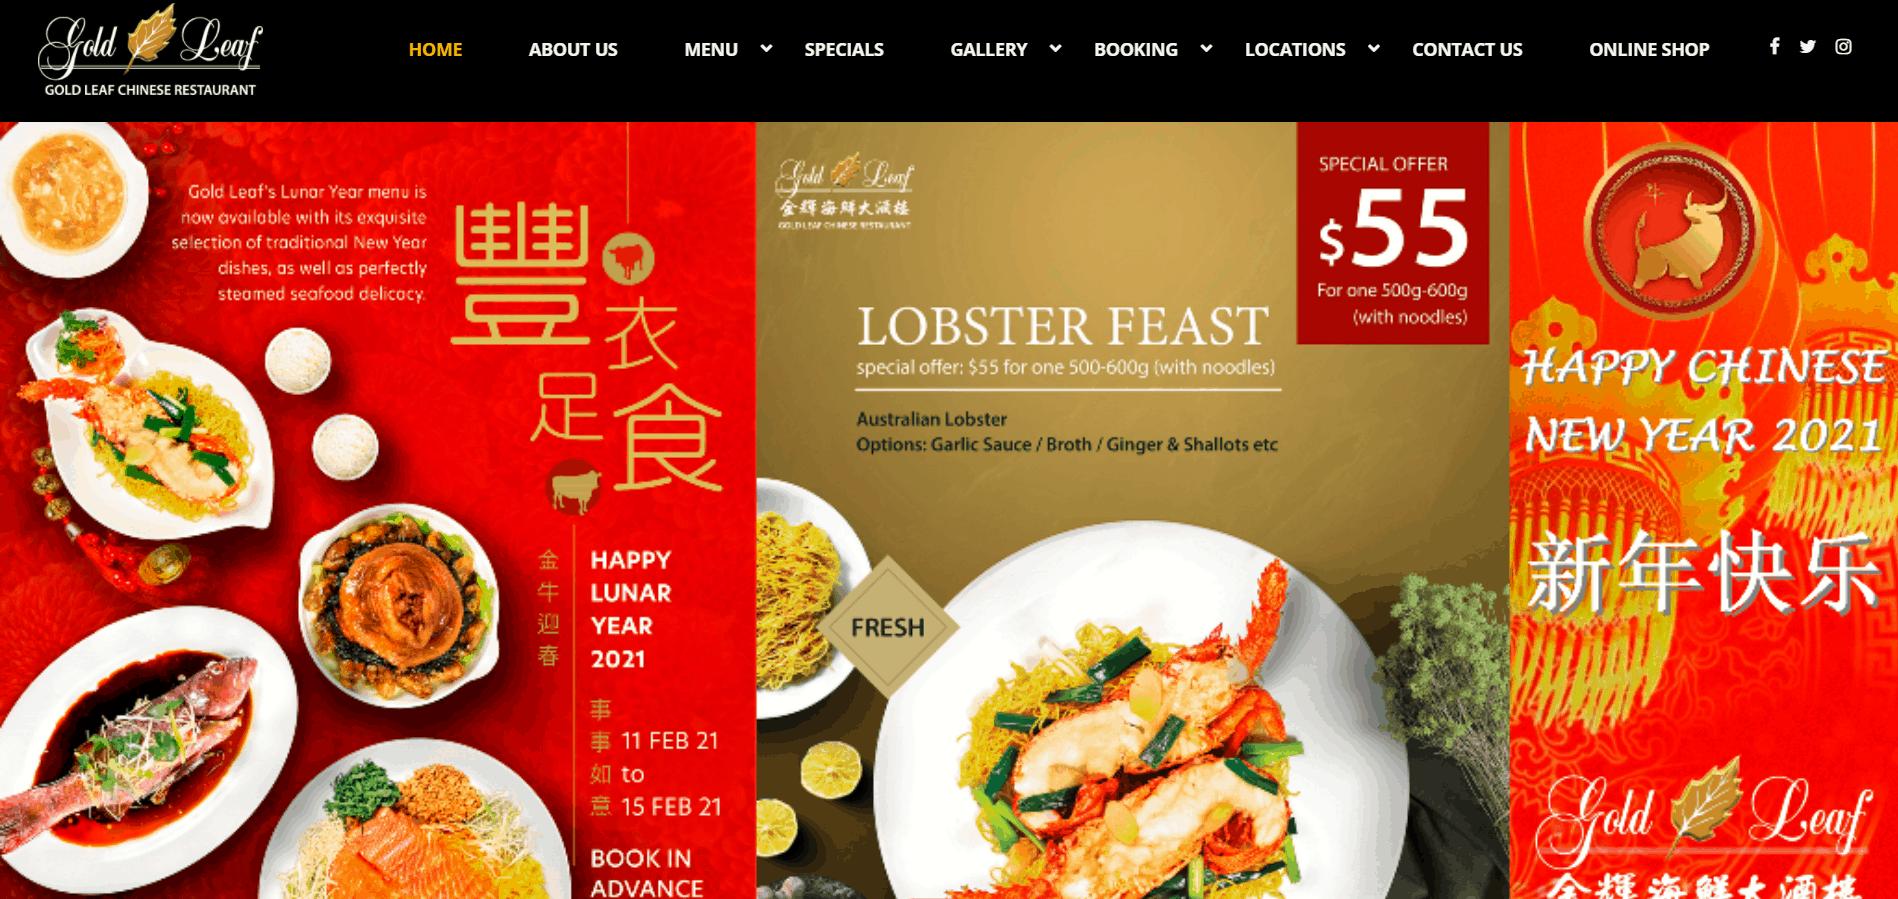 Gold Leaf Chinese Restaurant